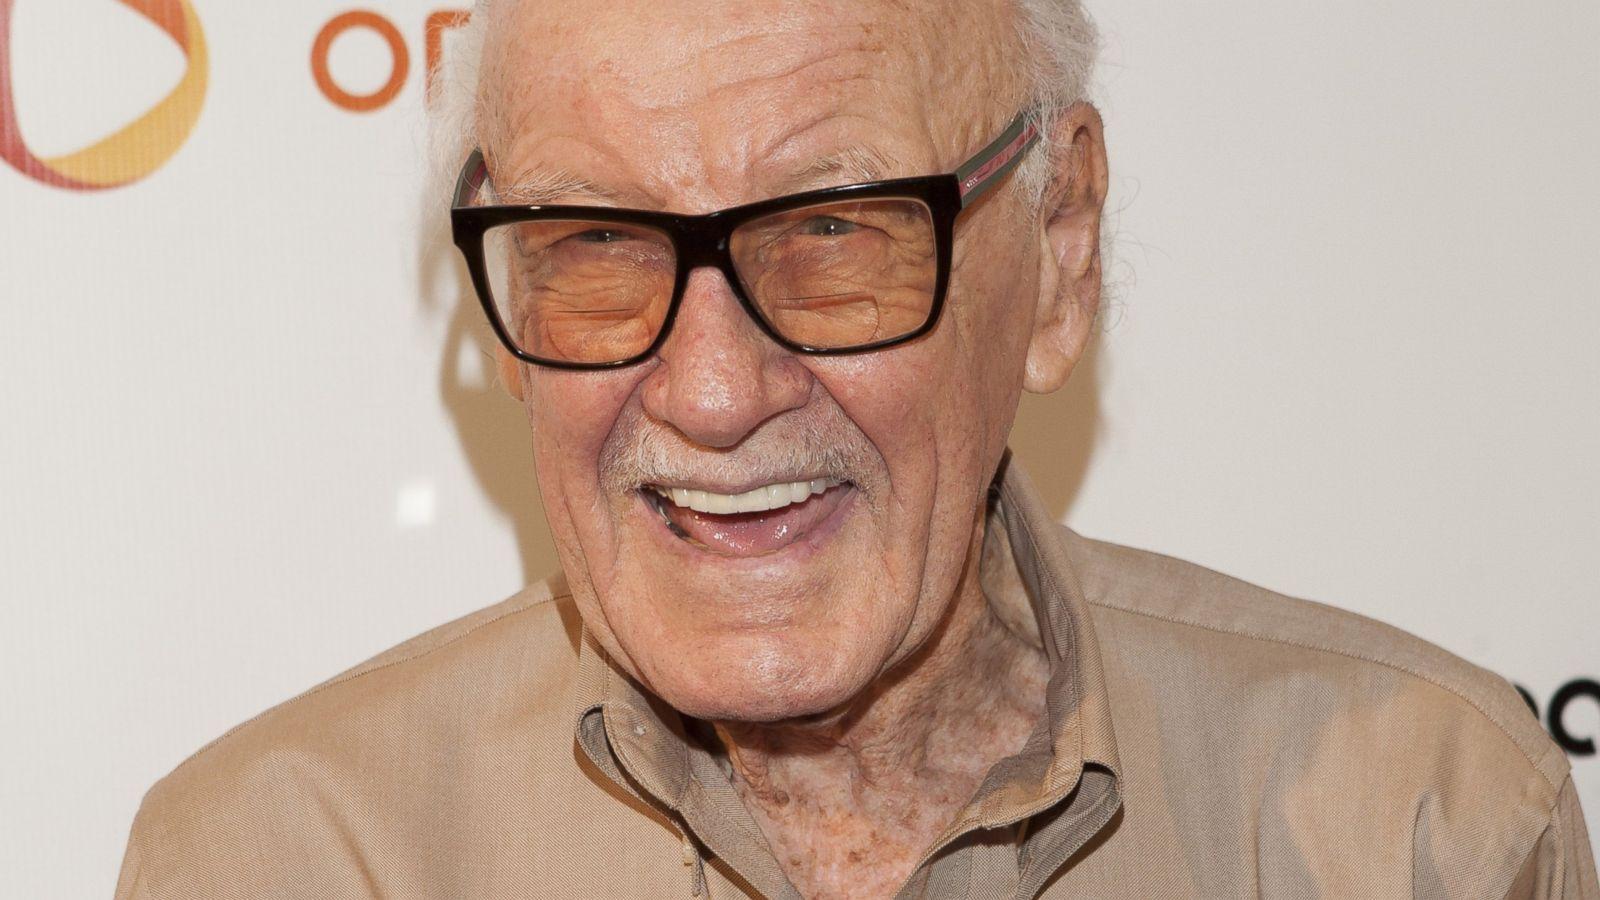 abcnews.go.com - Michael Rothman - Marvel Comics legend Stan Lee dies at 95